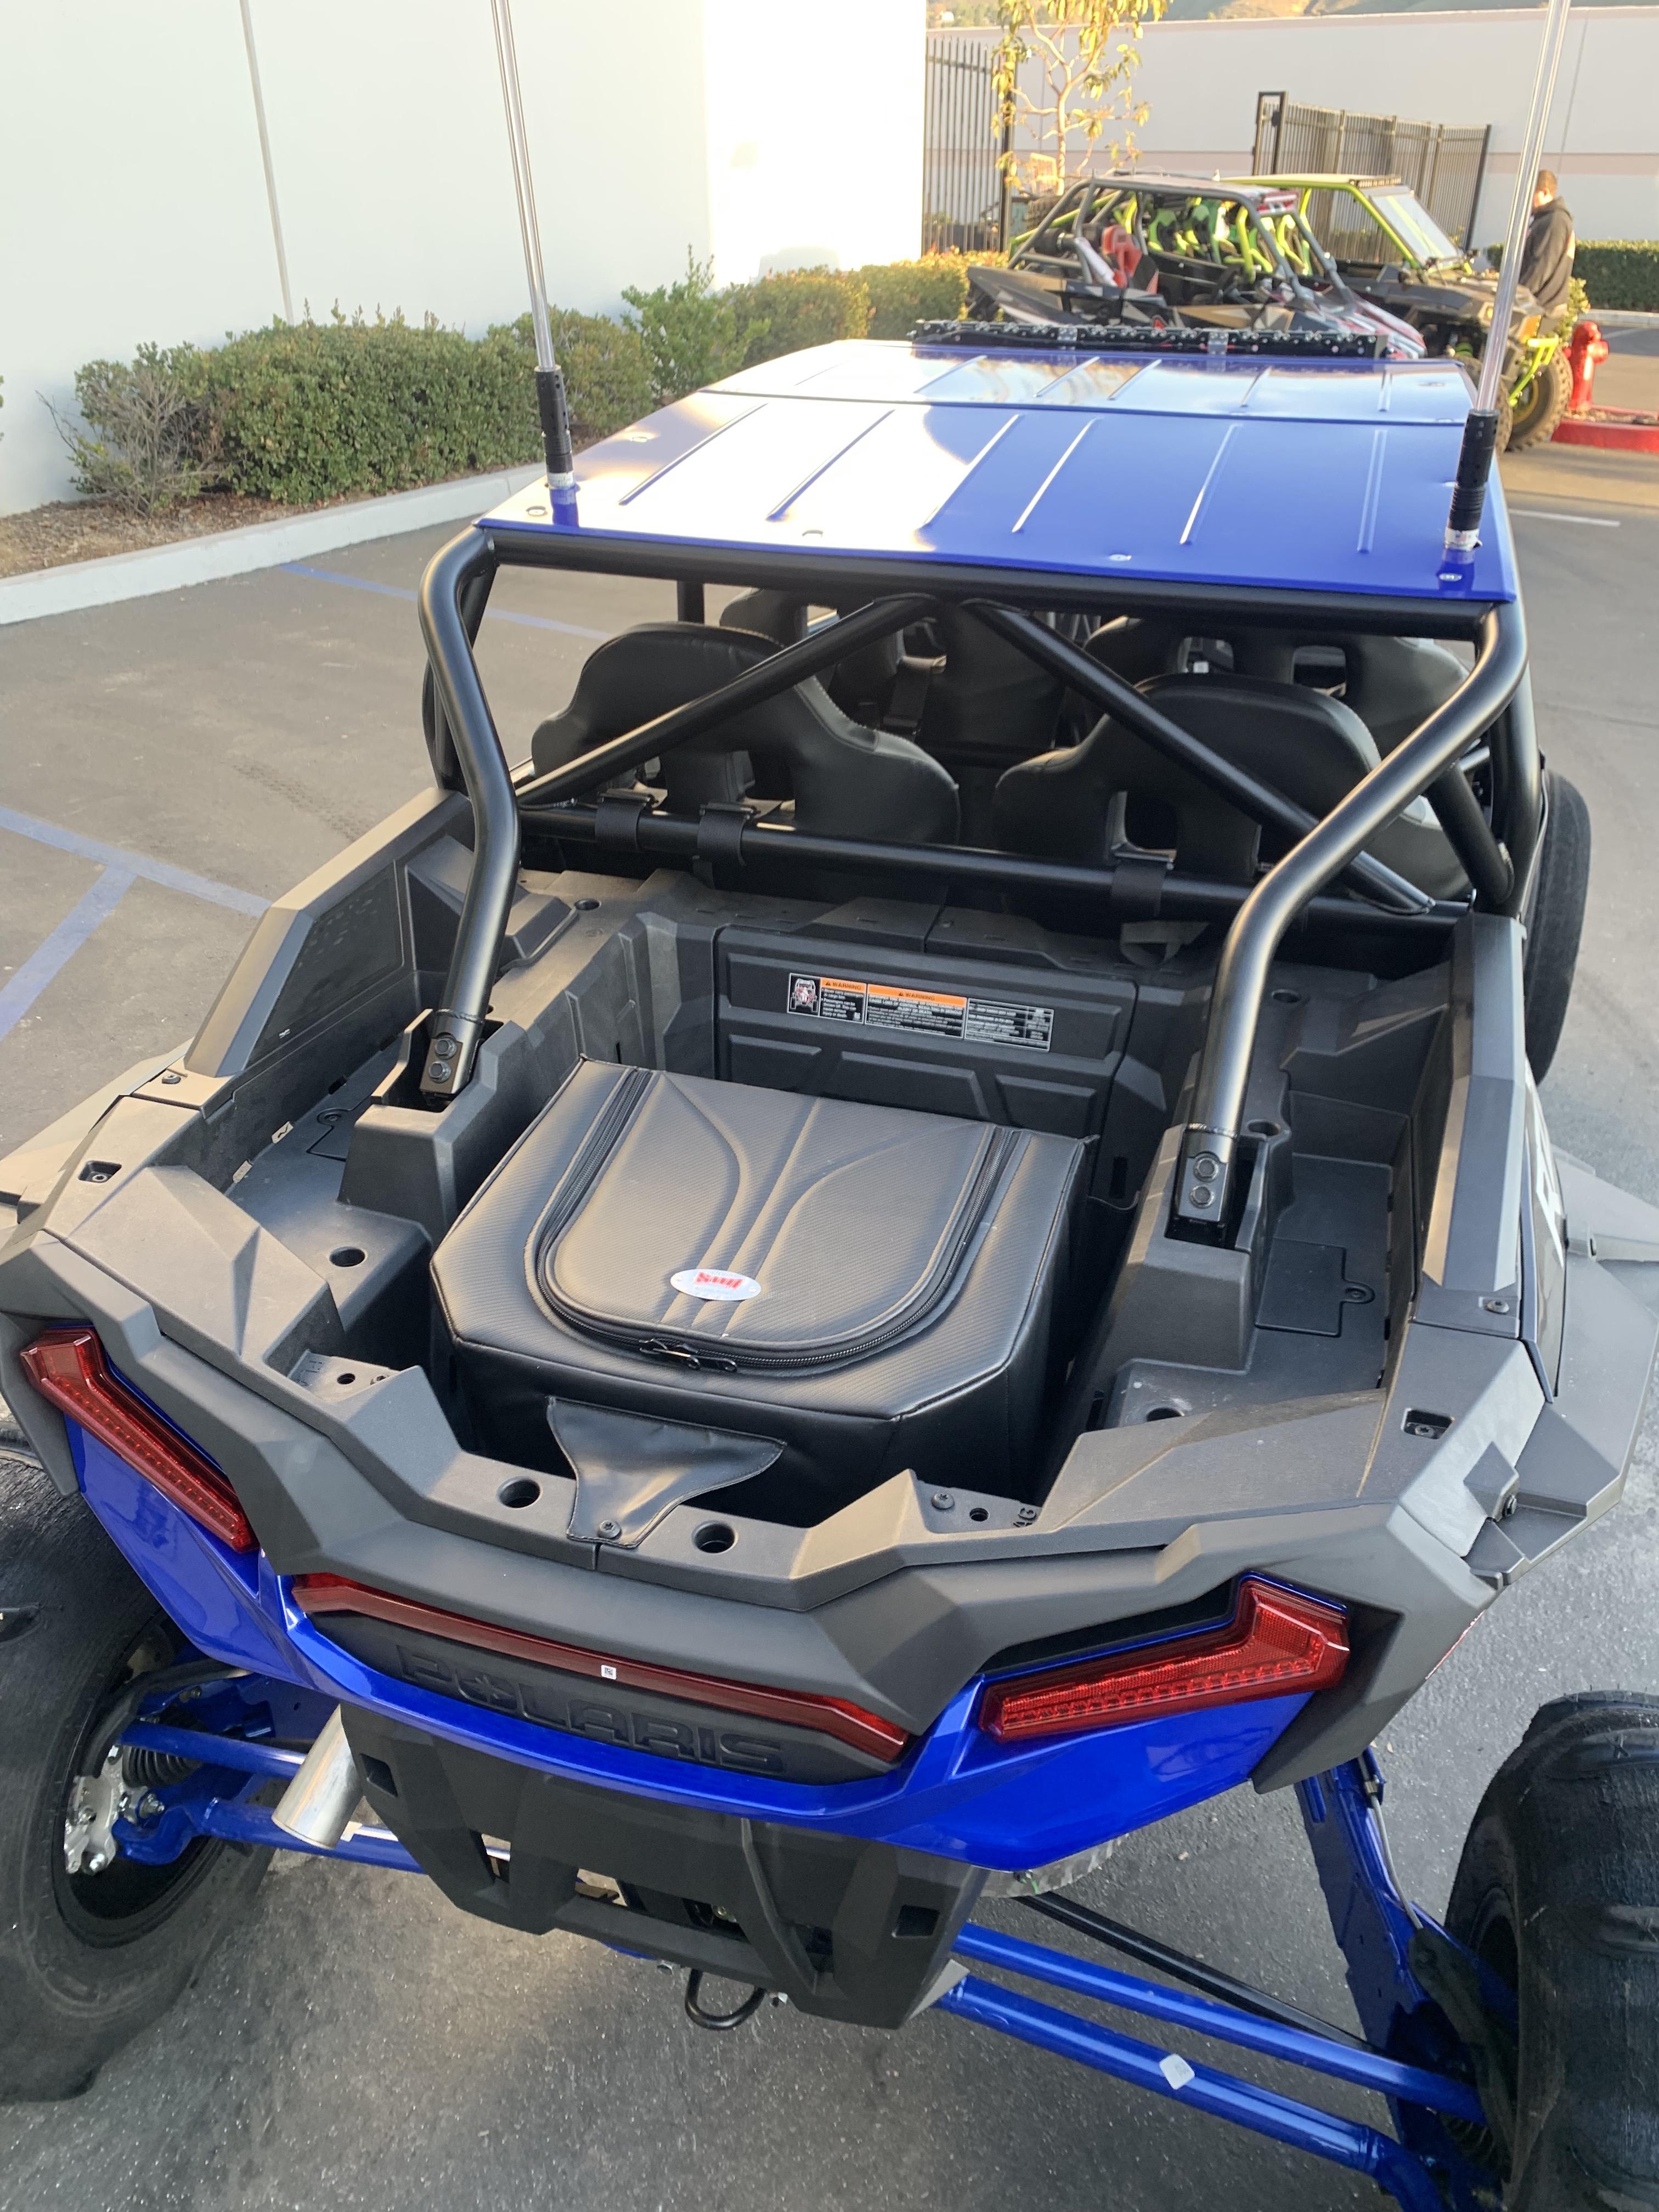 Sdr Motorsports Quot Shorty Quot Polaris Rzr Xp Turbo S 4 Seat Cage